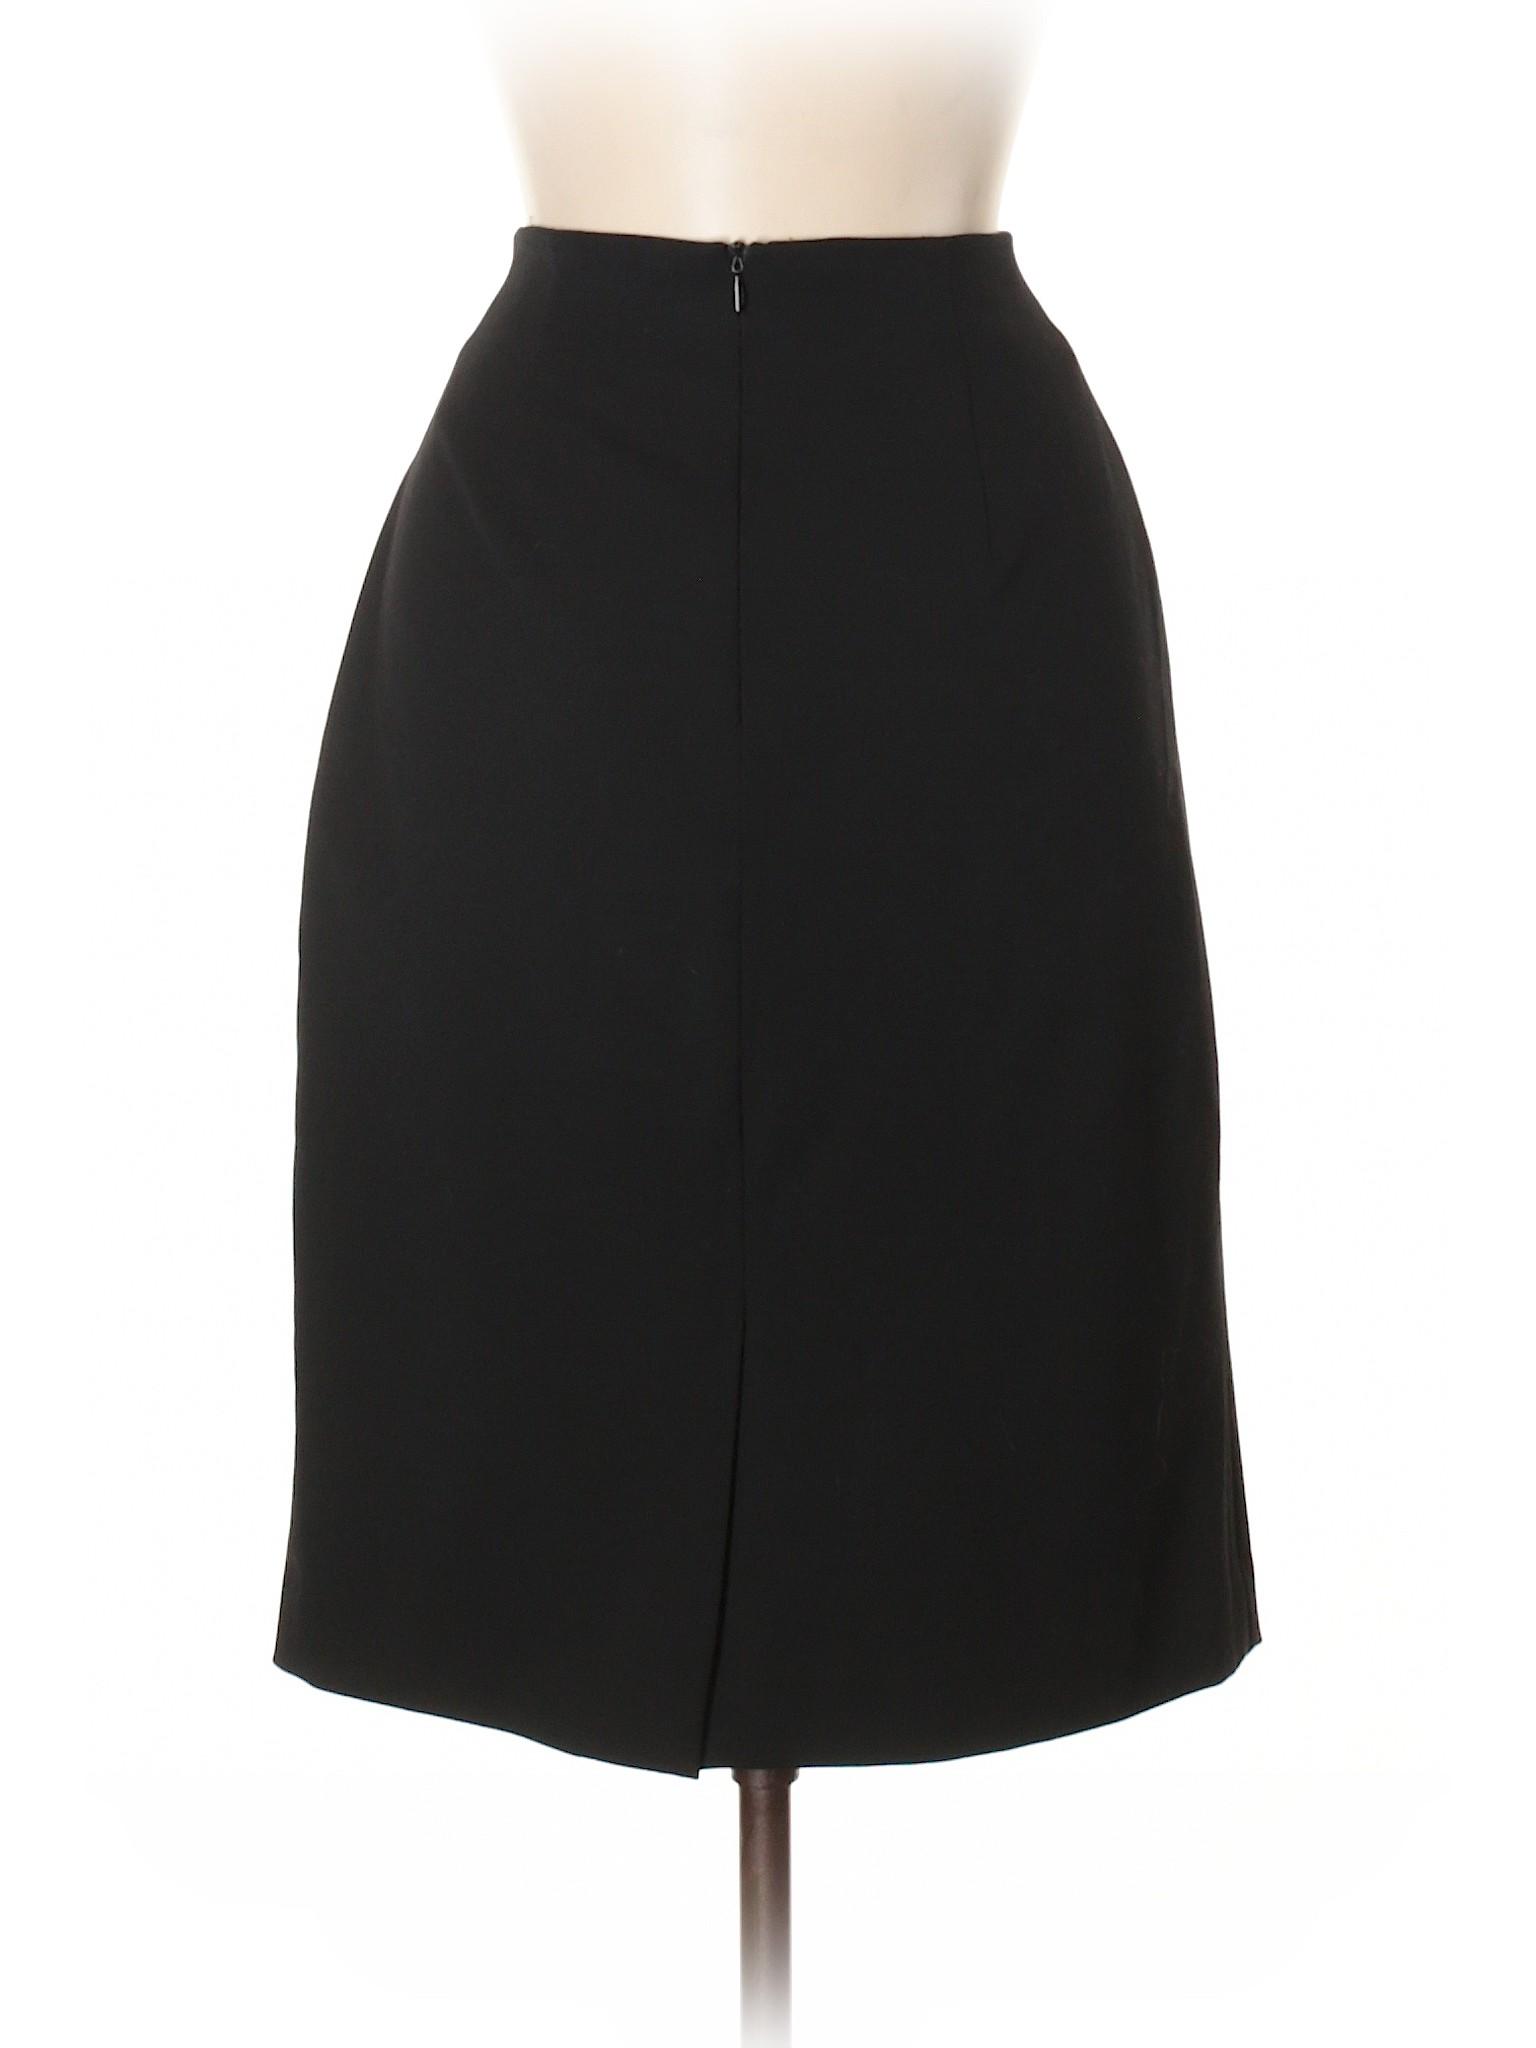 Boutique Wool Wool Wool Skirt Boutique Wool Boutique Skirt Skirt Boutique 58xgqg